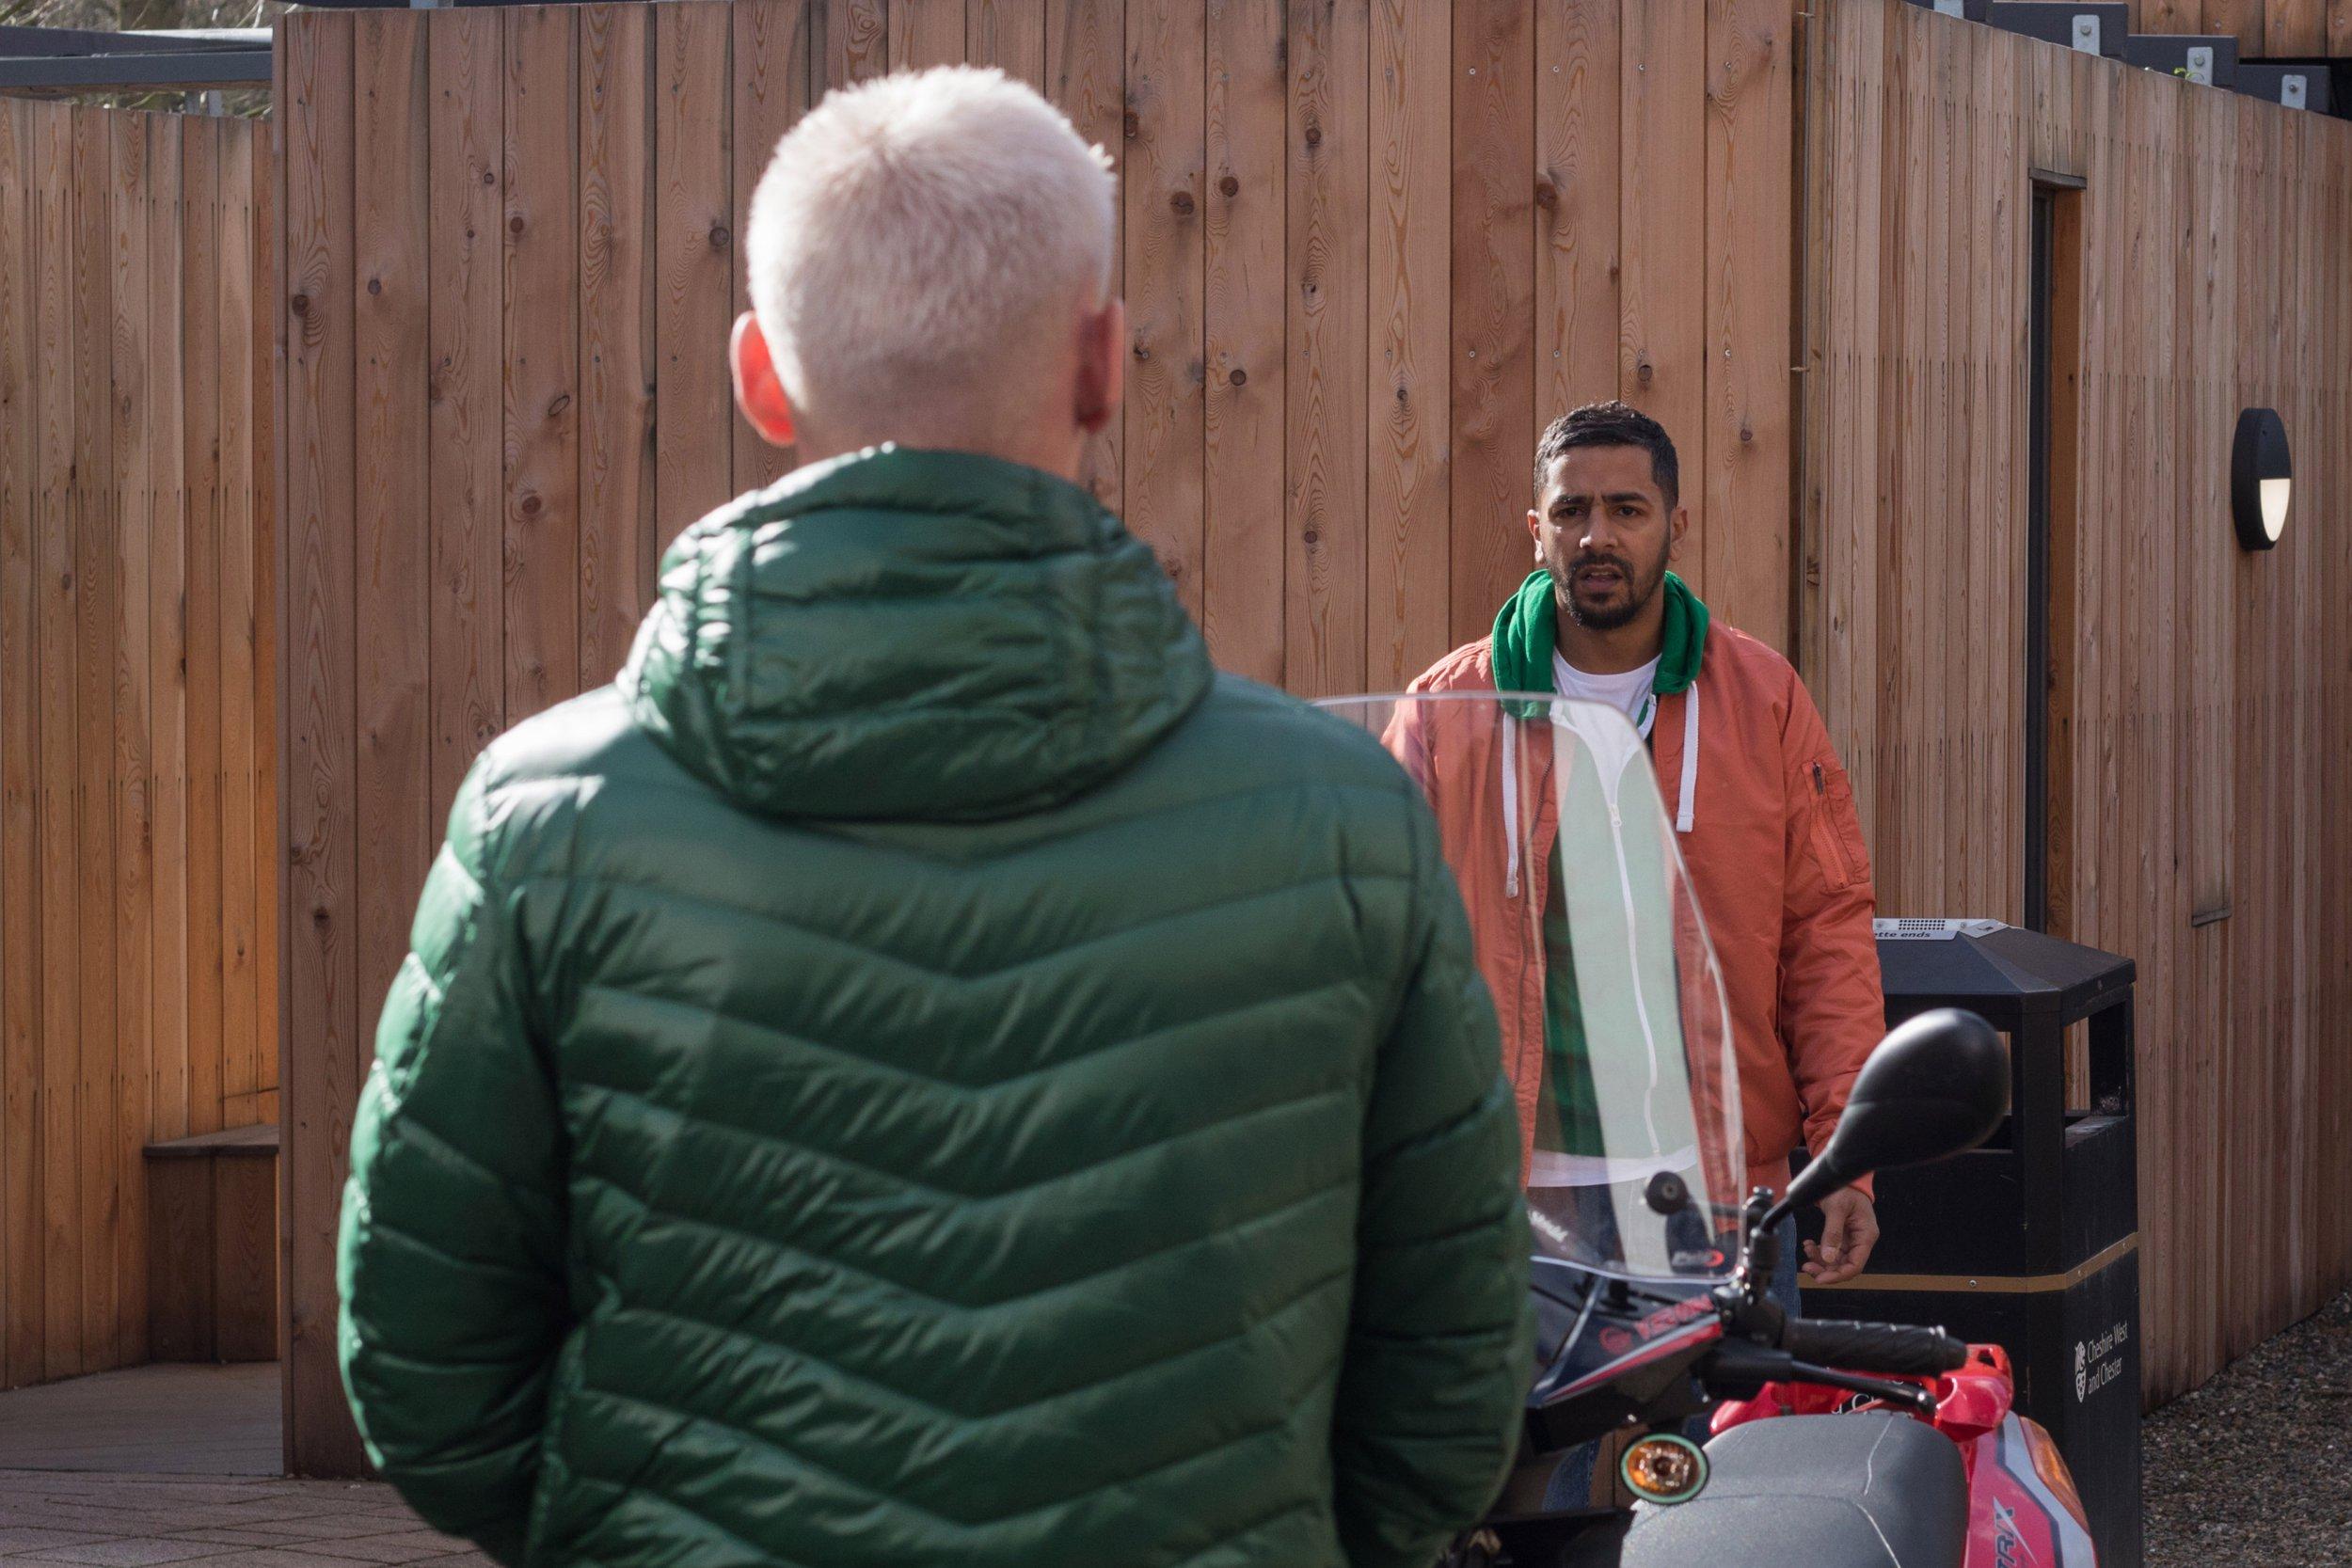 Ste Hay (Kieran Richardson) involved in racist attack